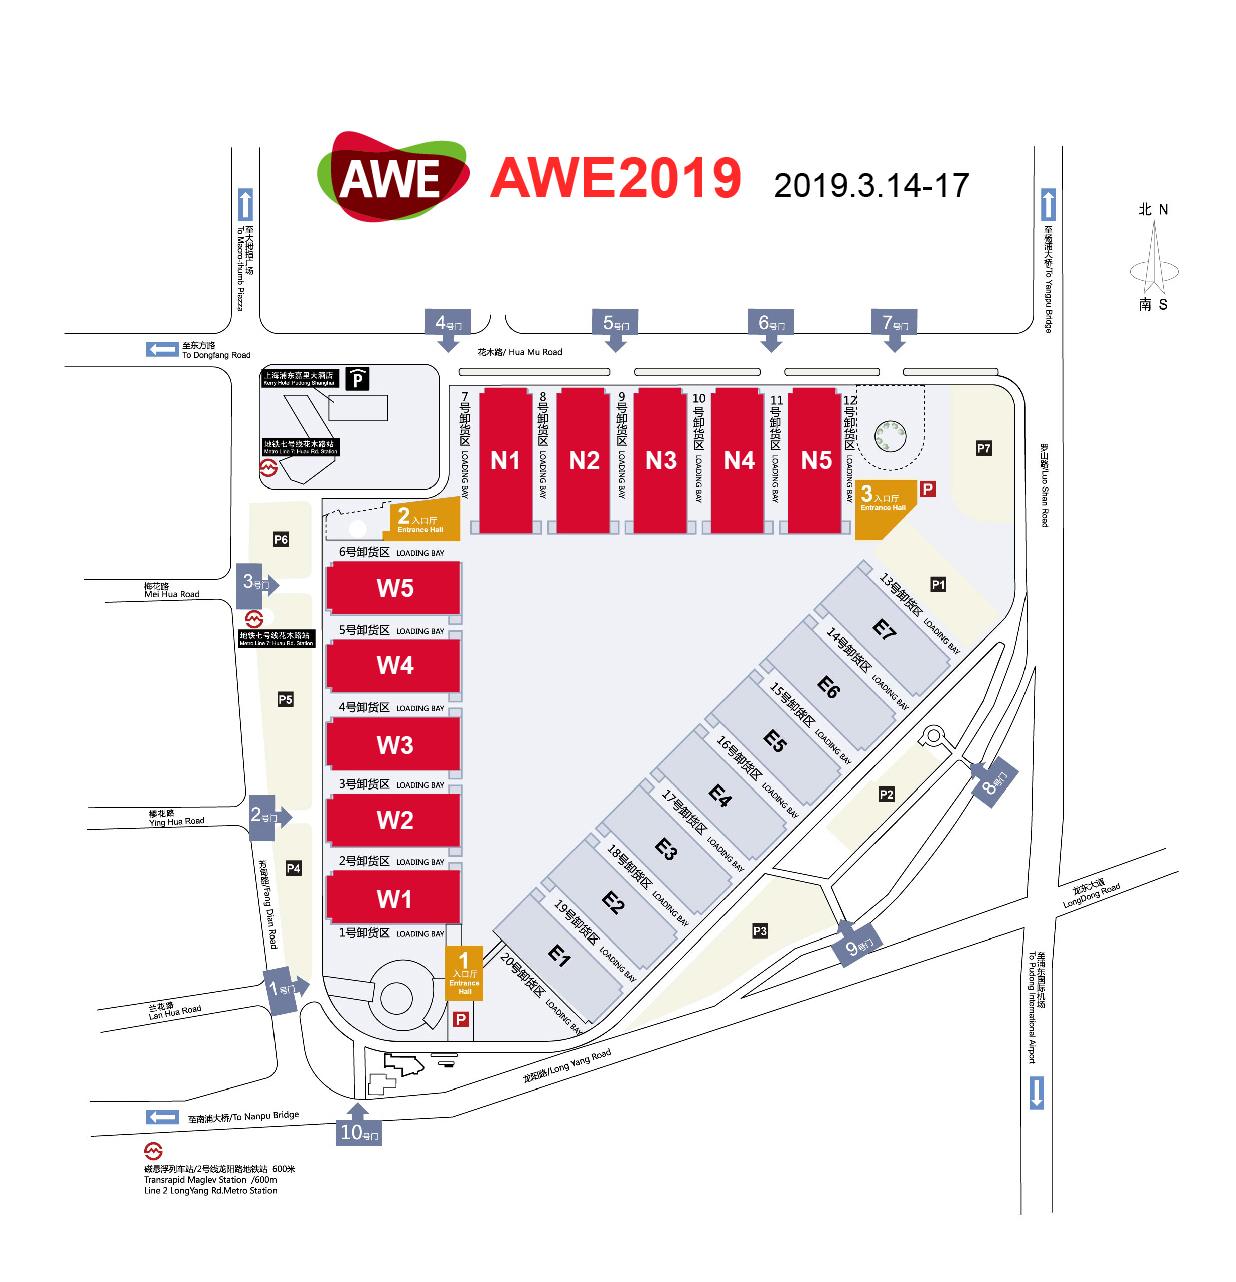 AWE2019分布图.jpg